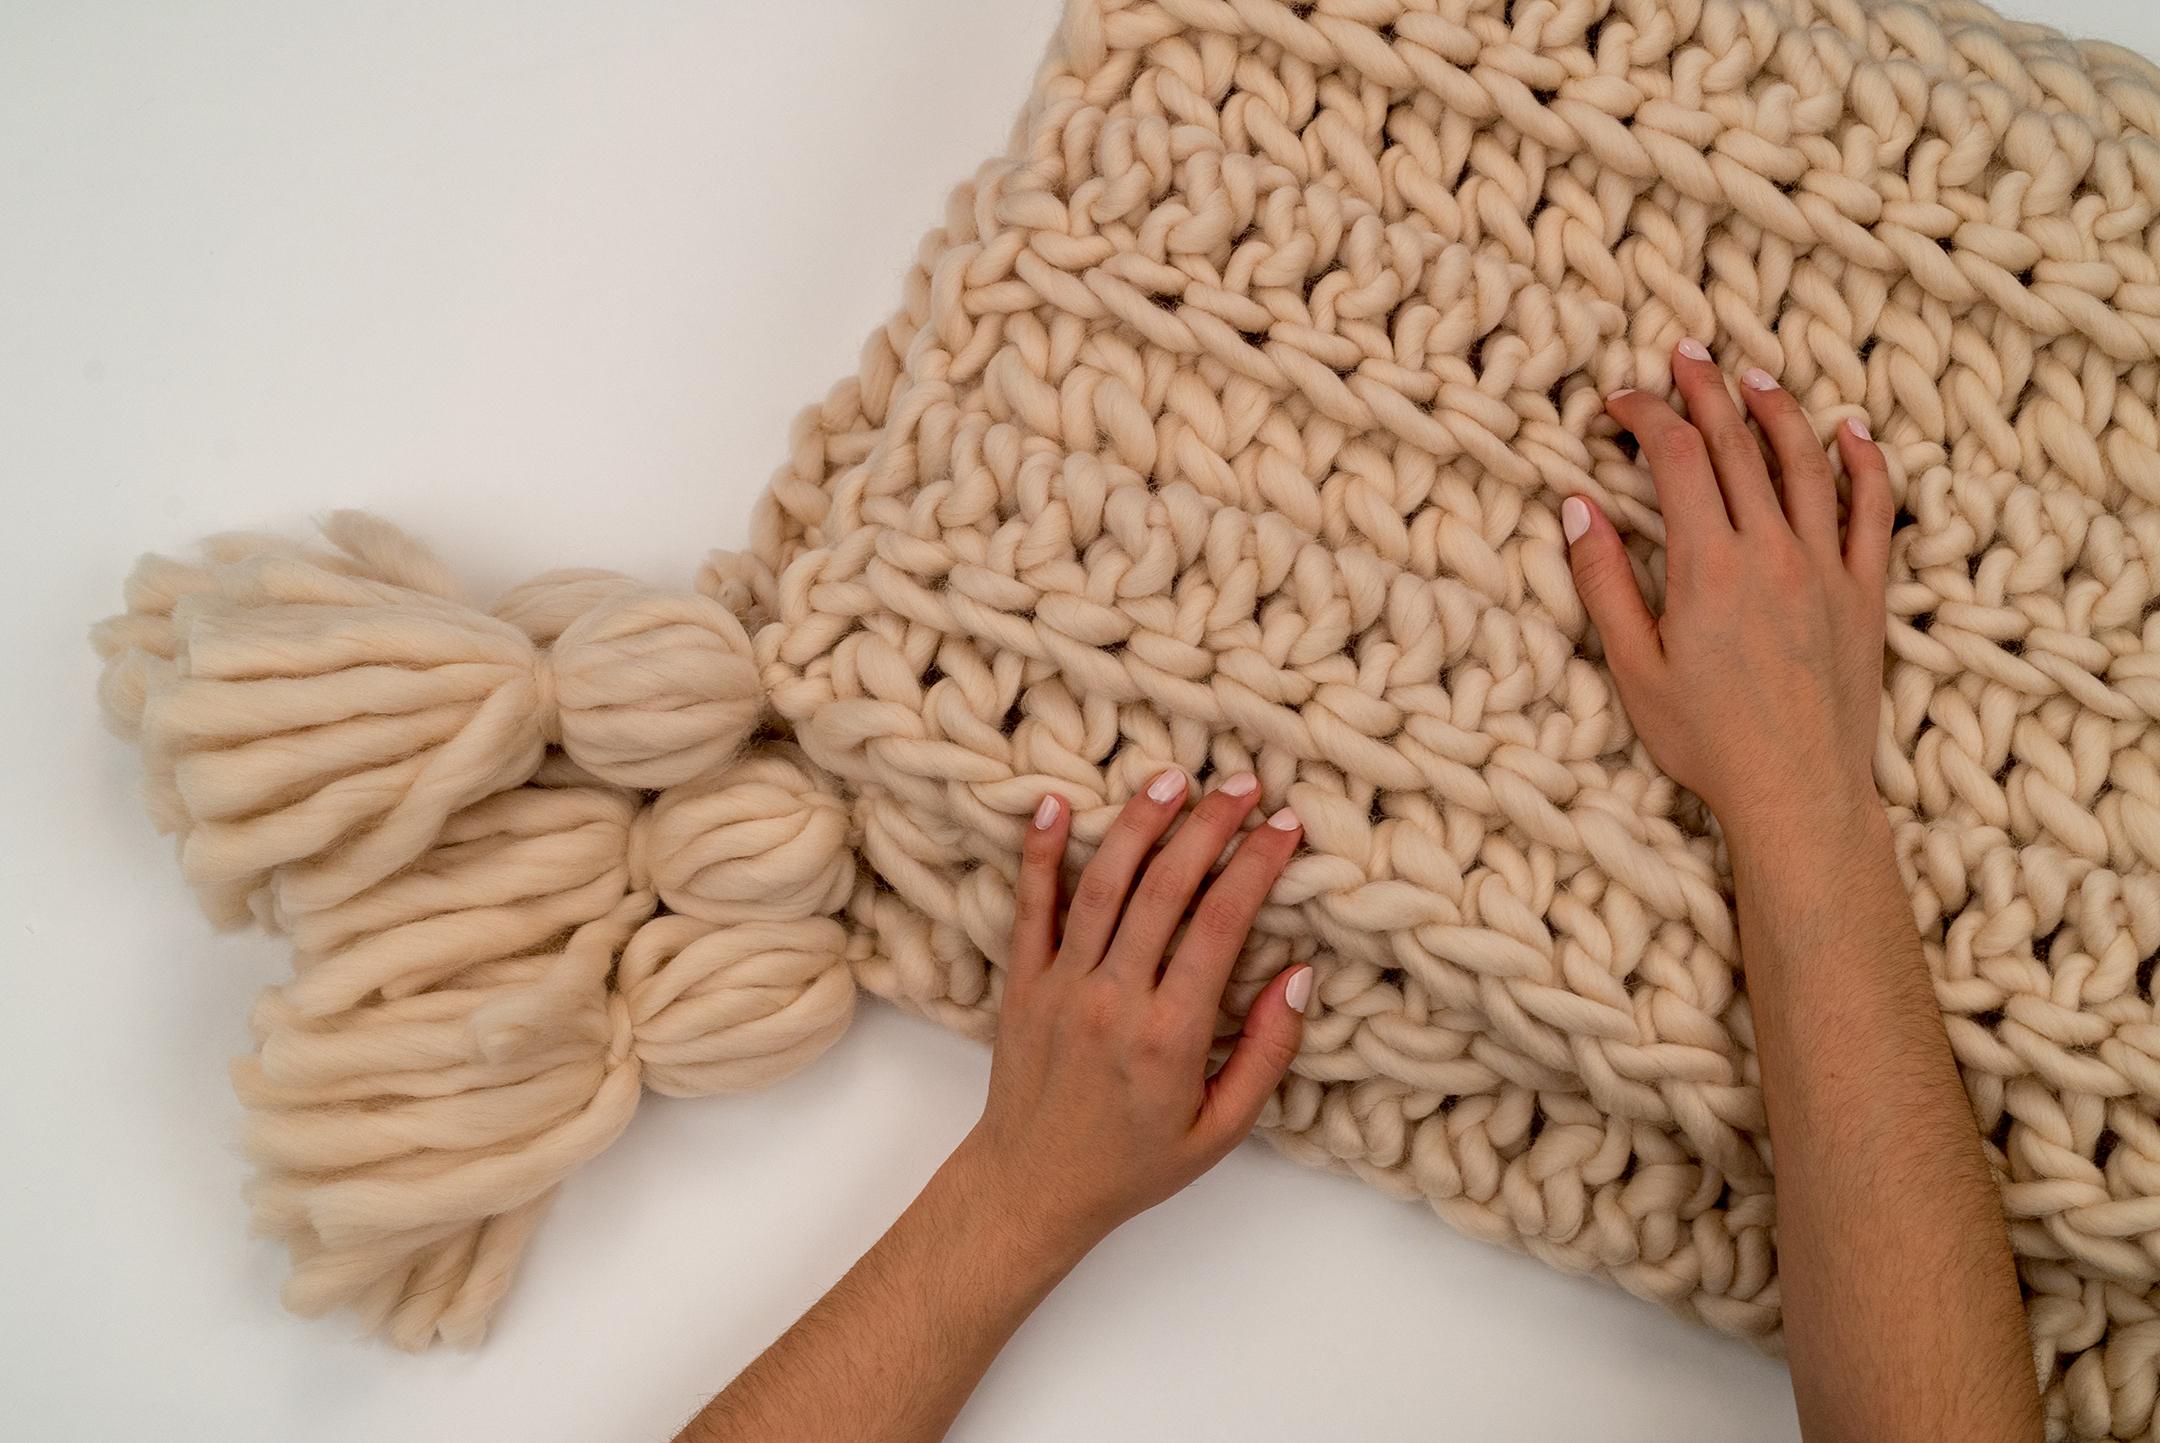 Crochet Blanket With 25Mm Hook